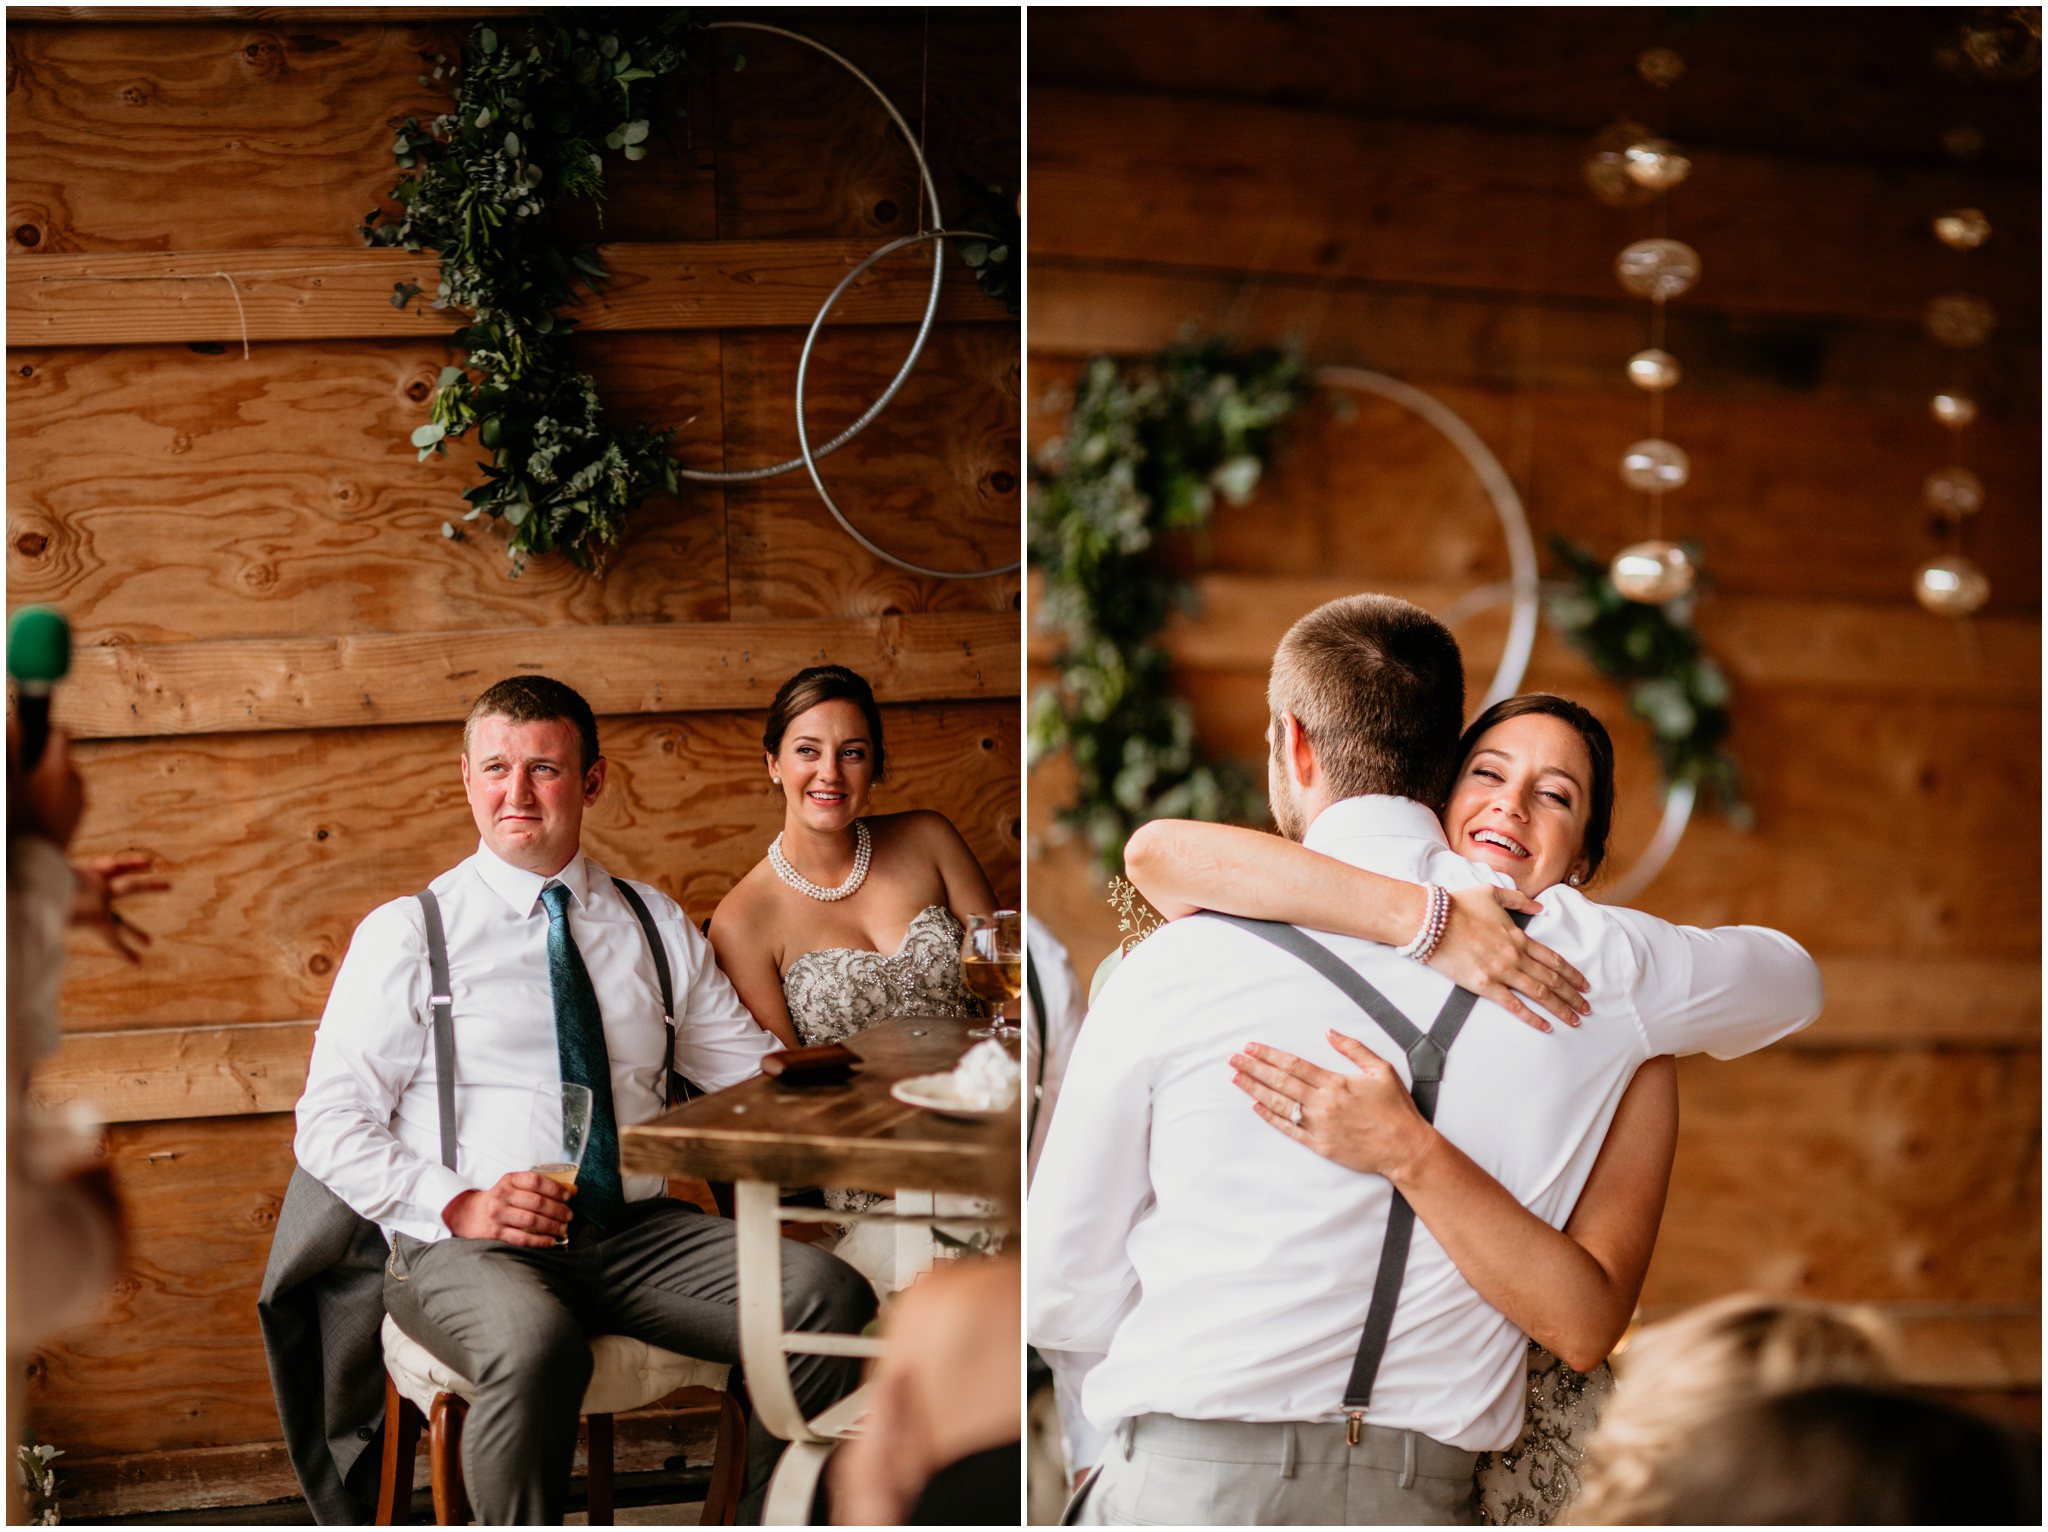 alex-and-matthew-three-cs-farm-venue-seattle-wedding-photographer-128.jpg